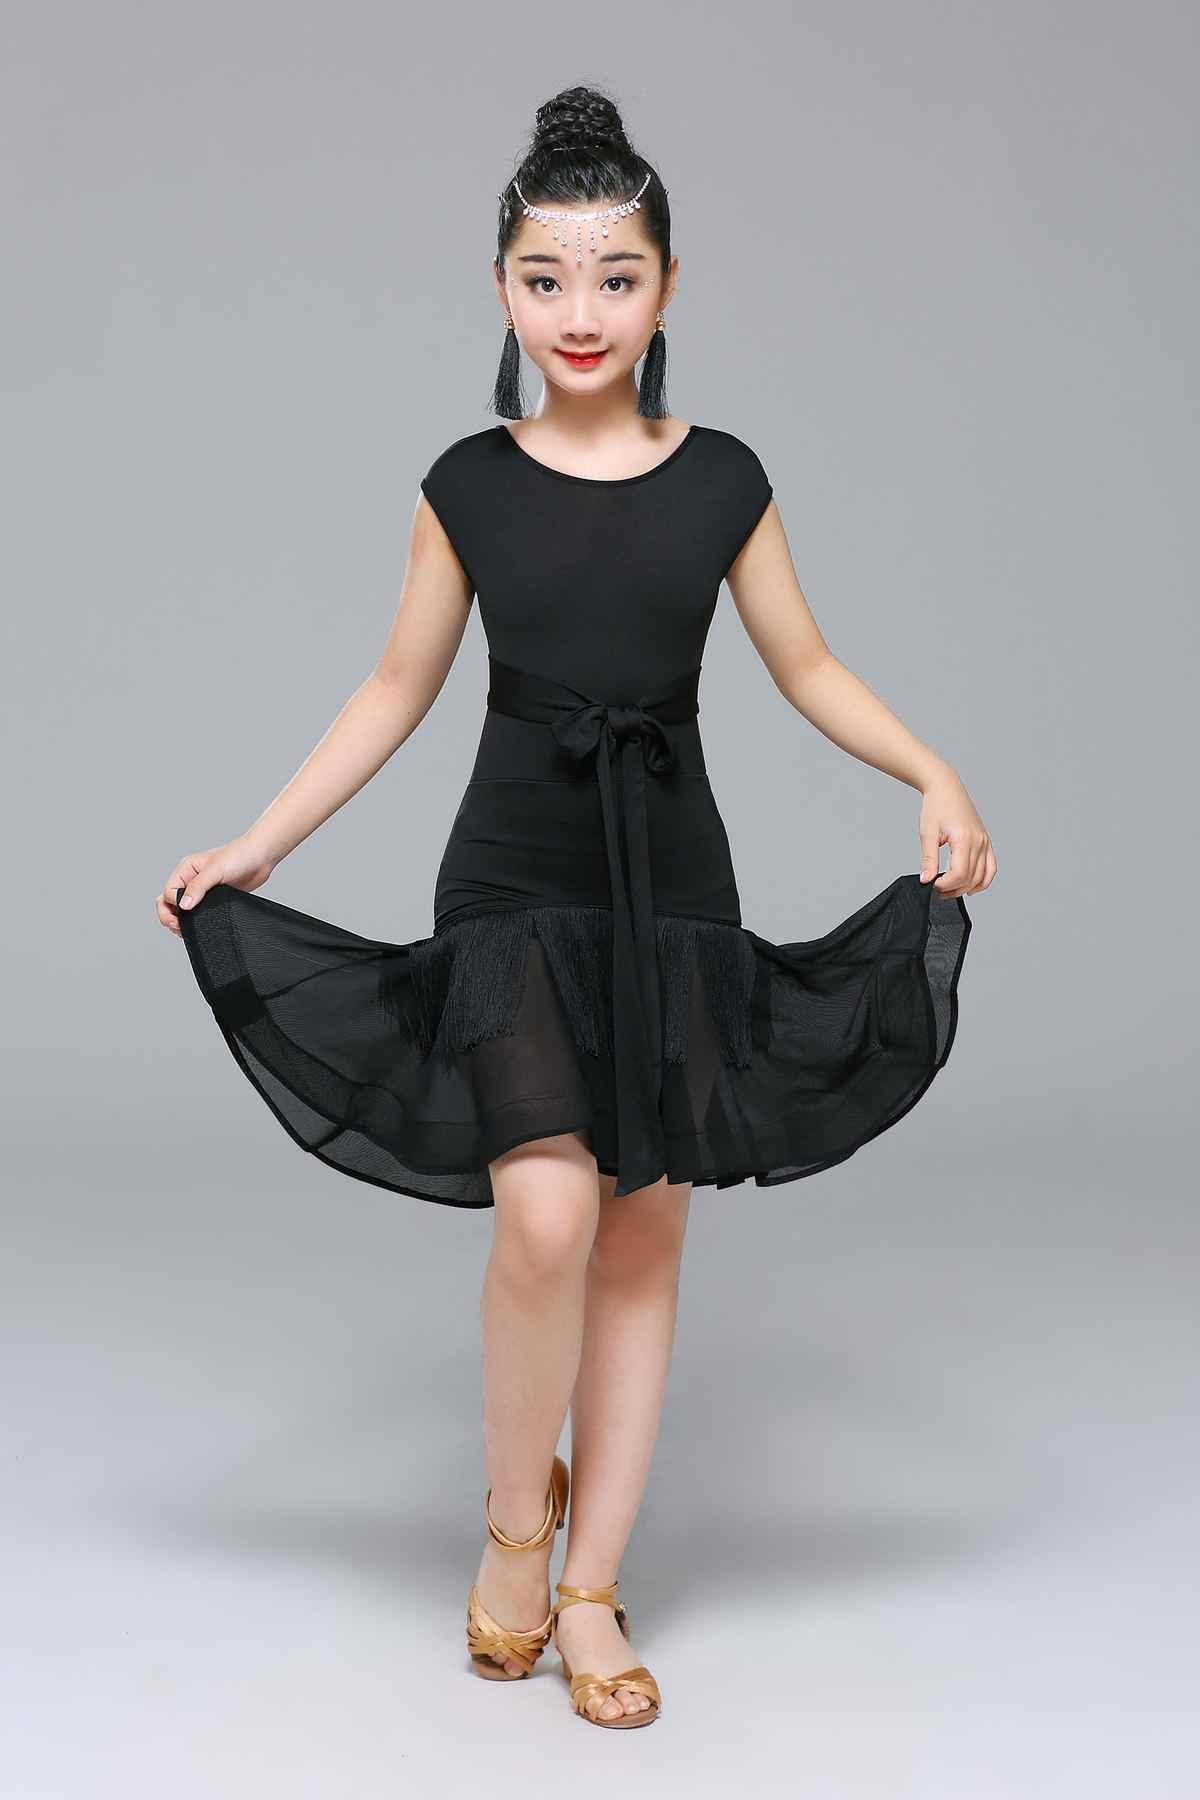 Anak Anak Anak Profesional Latin Dijual Gaun Pola Ballroom Gaun Anak Rumba Cha Cha Kostum